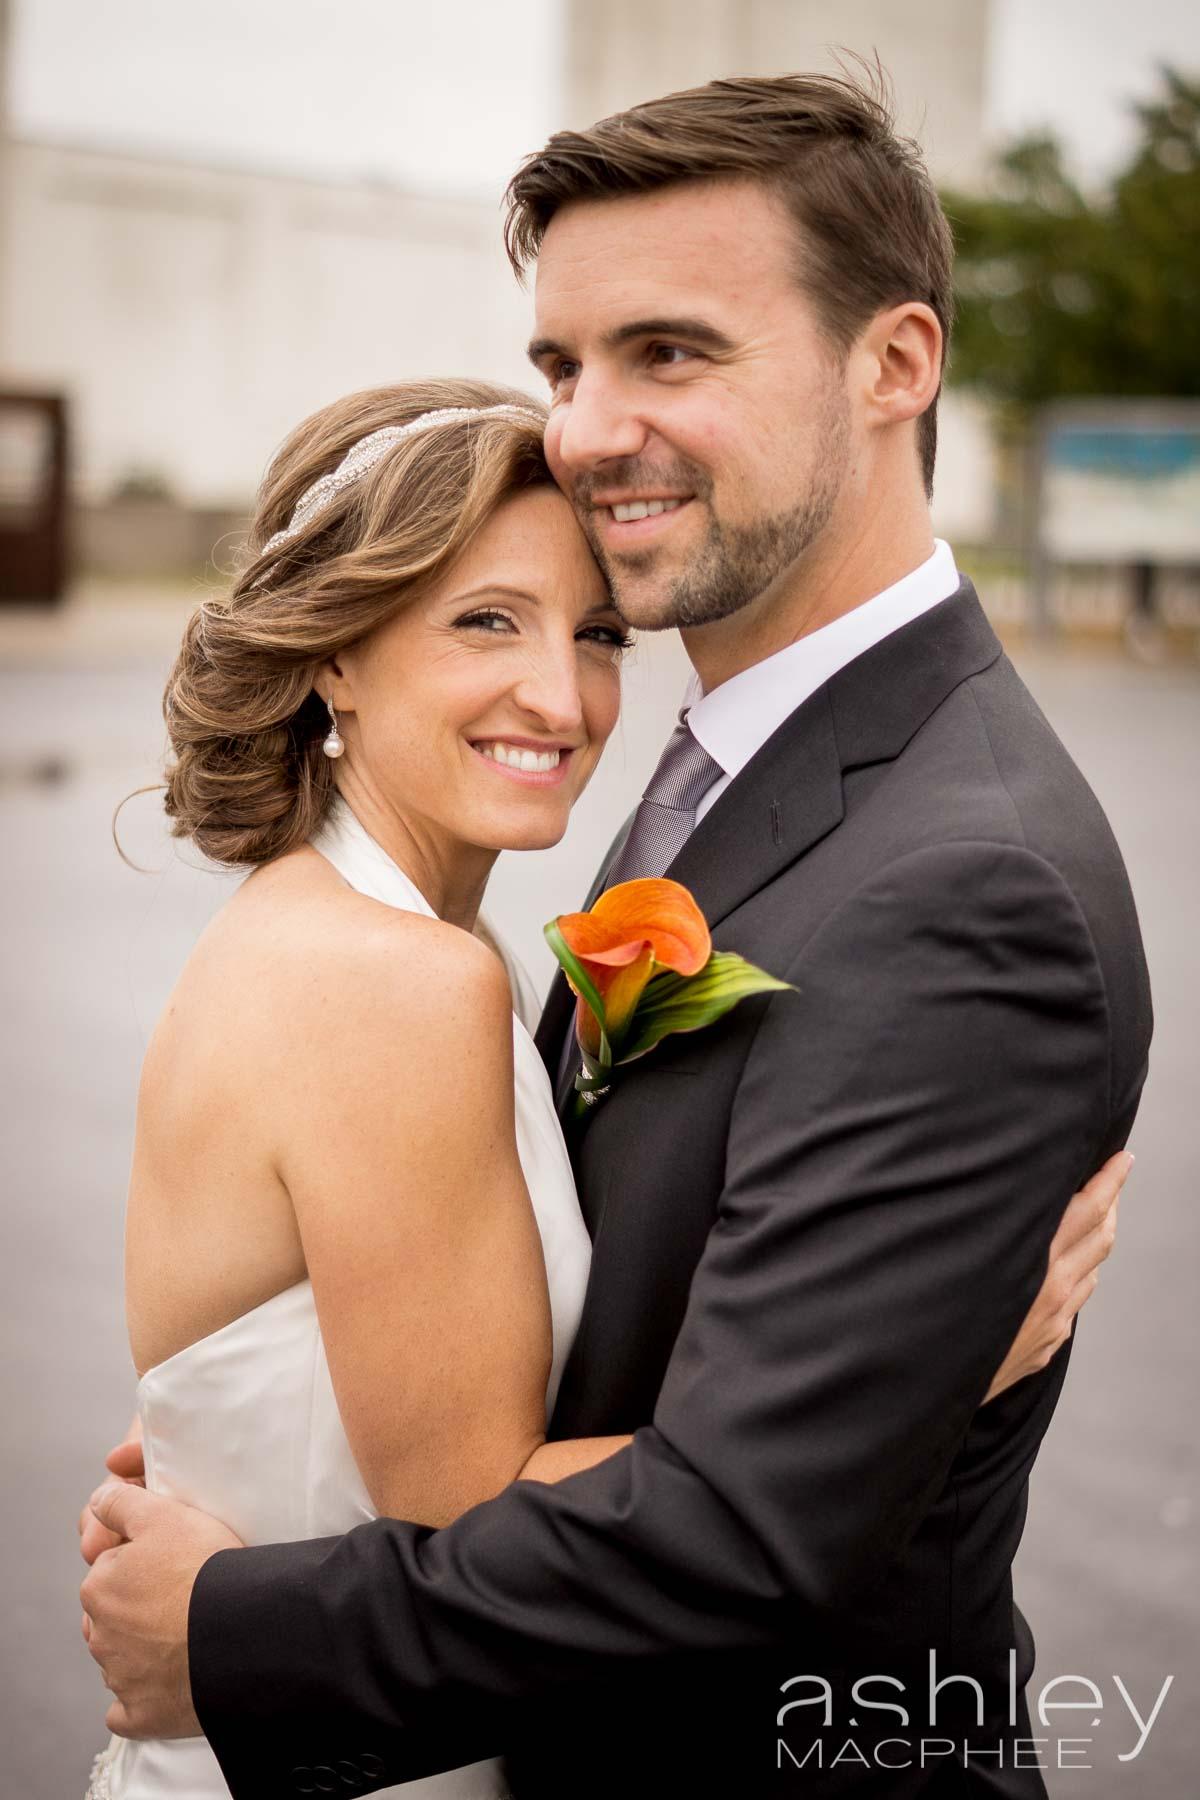 Ashley MacPhee Photography Science CEnter Wedding Photos (5 of 8).jpg